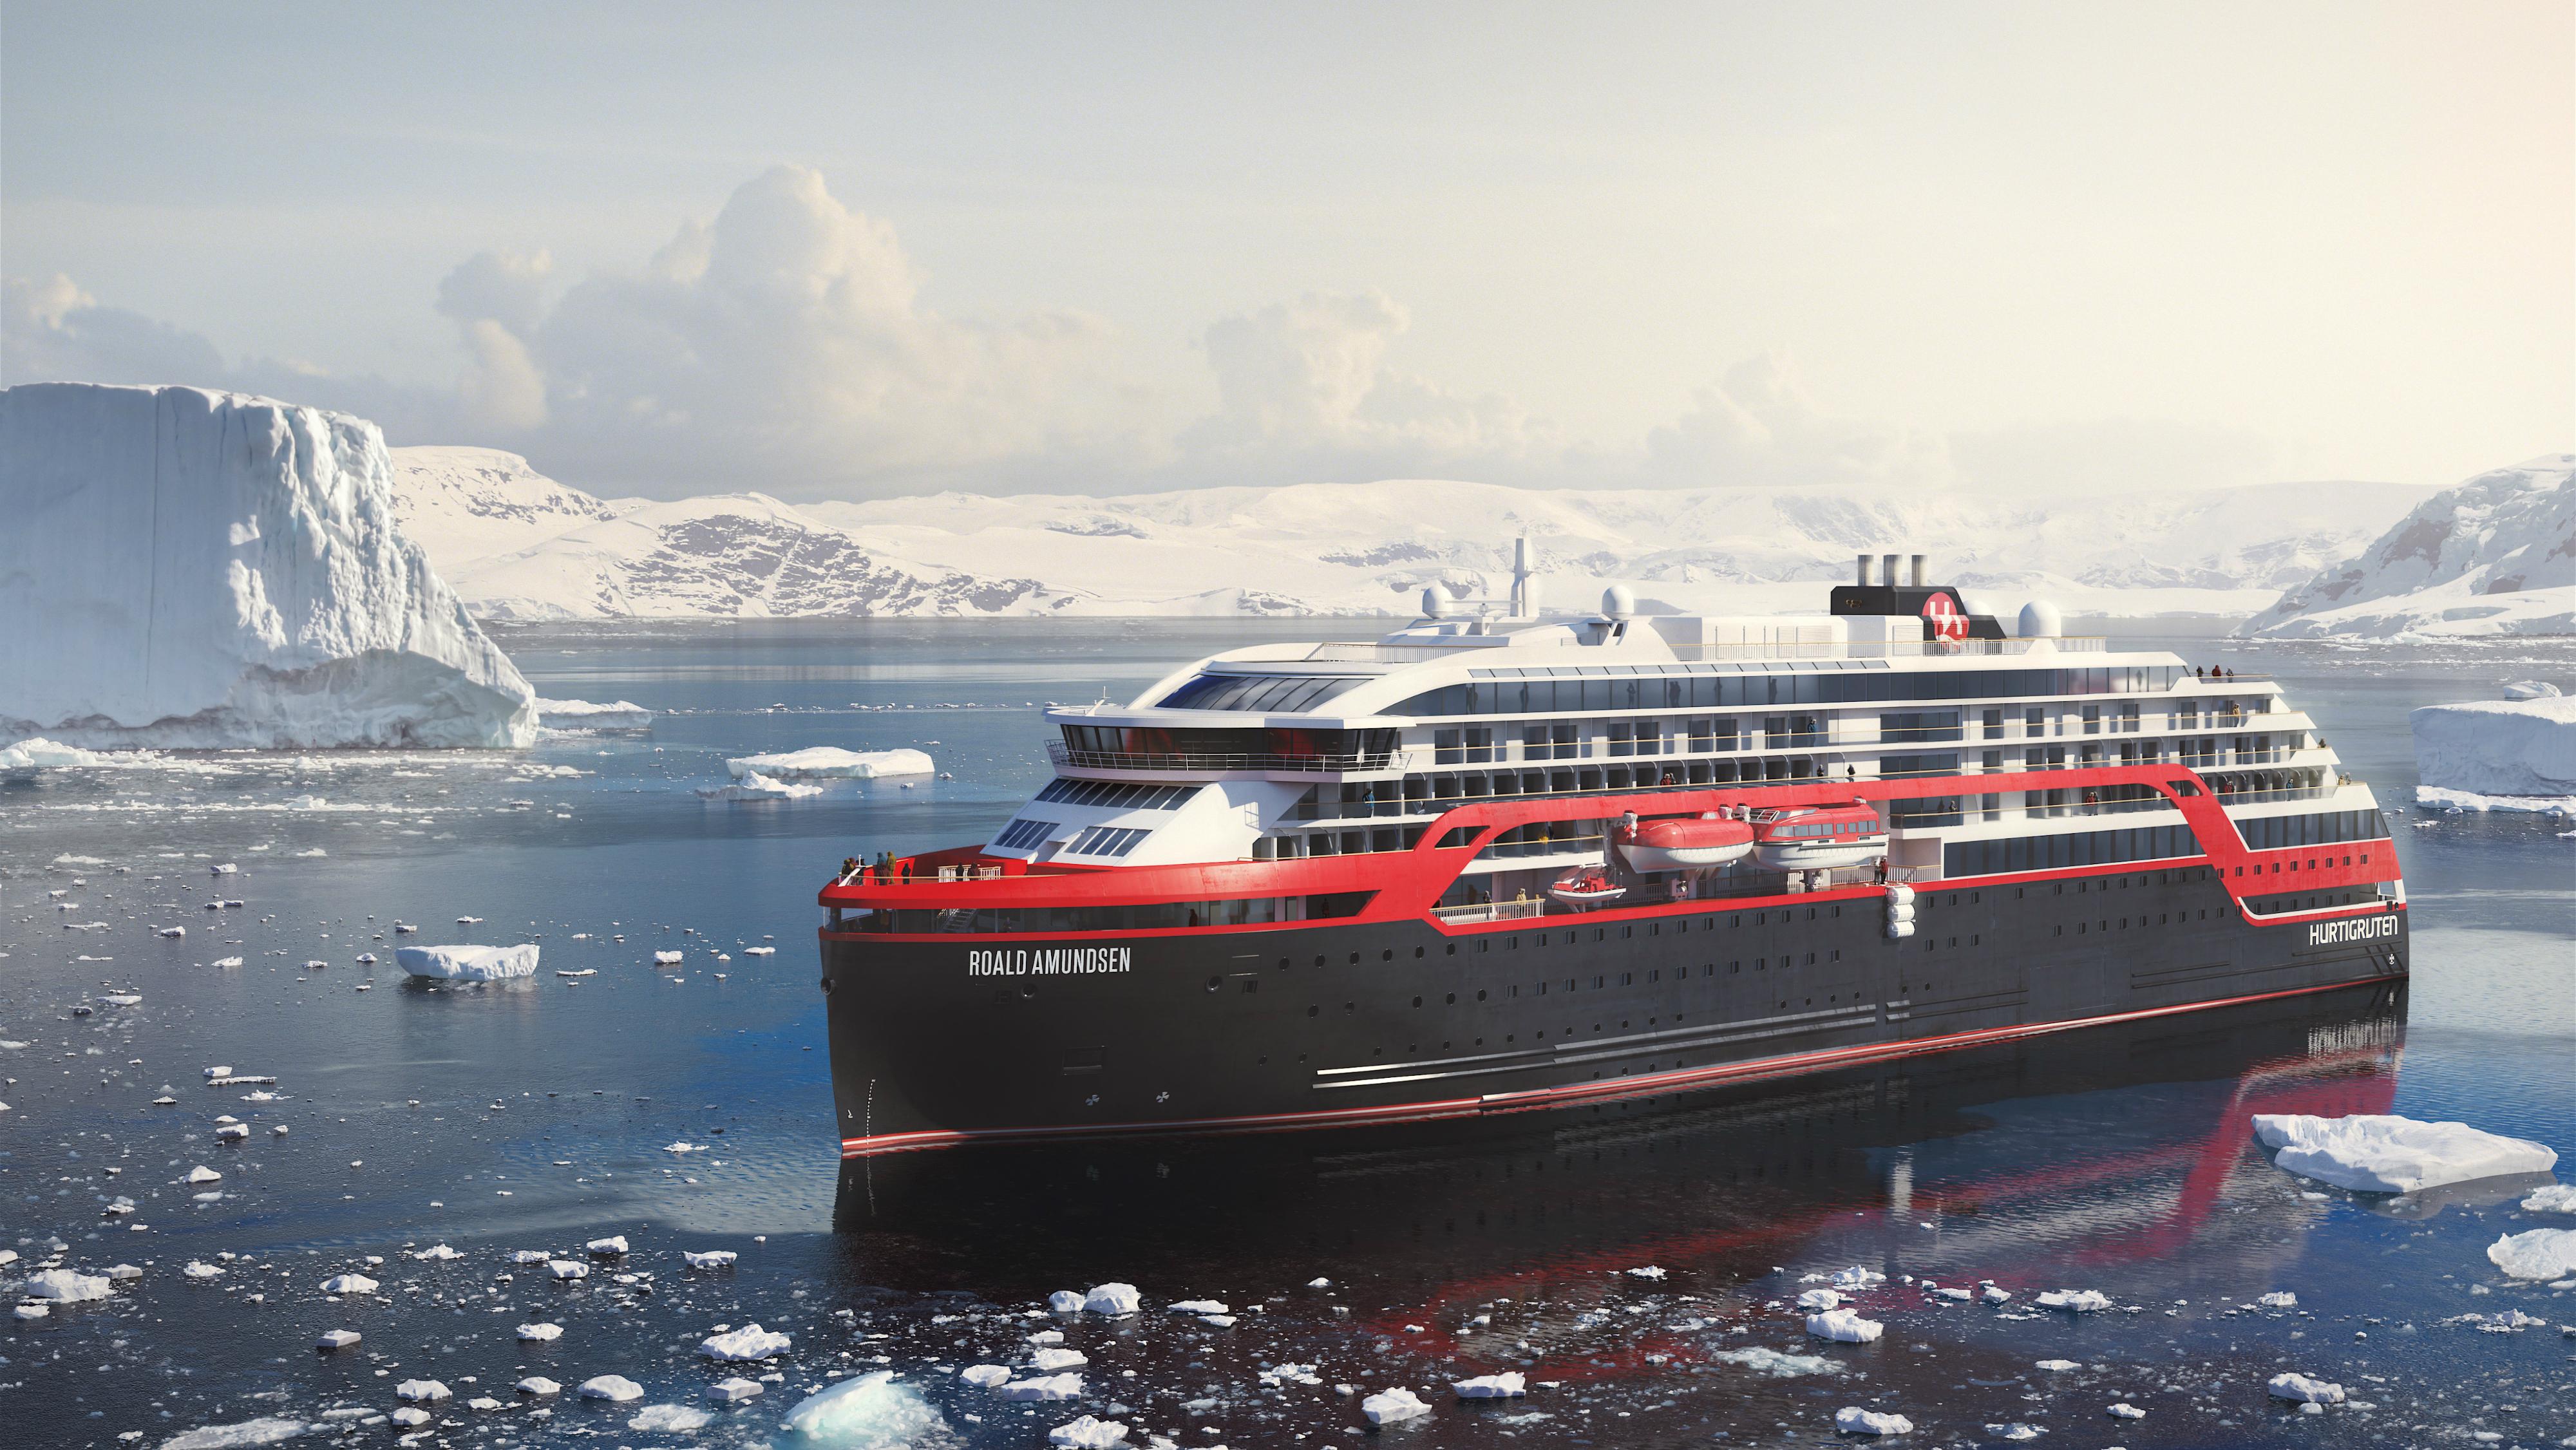 MS-Roald-Amundsen-HGR-113976